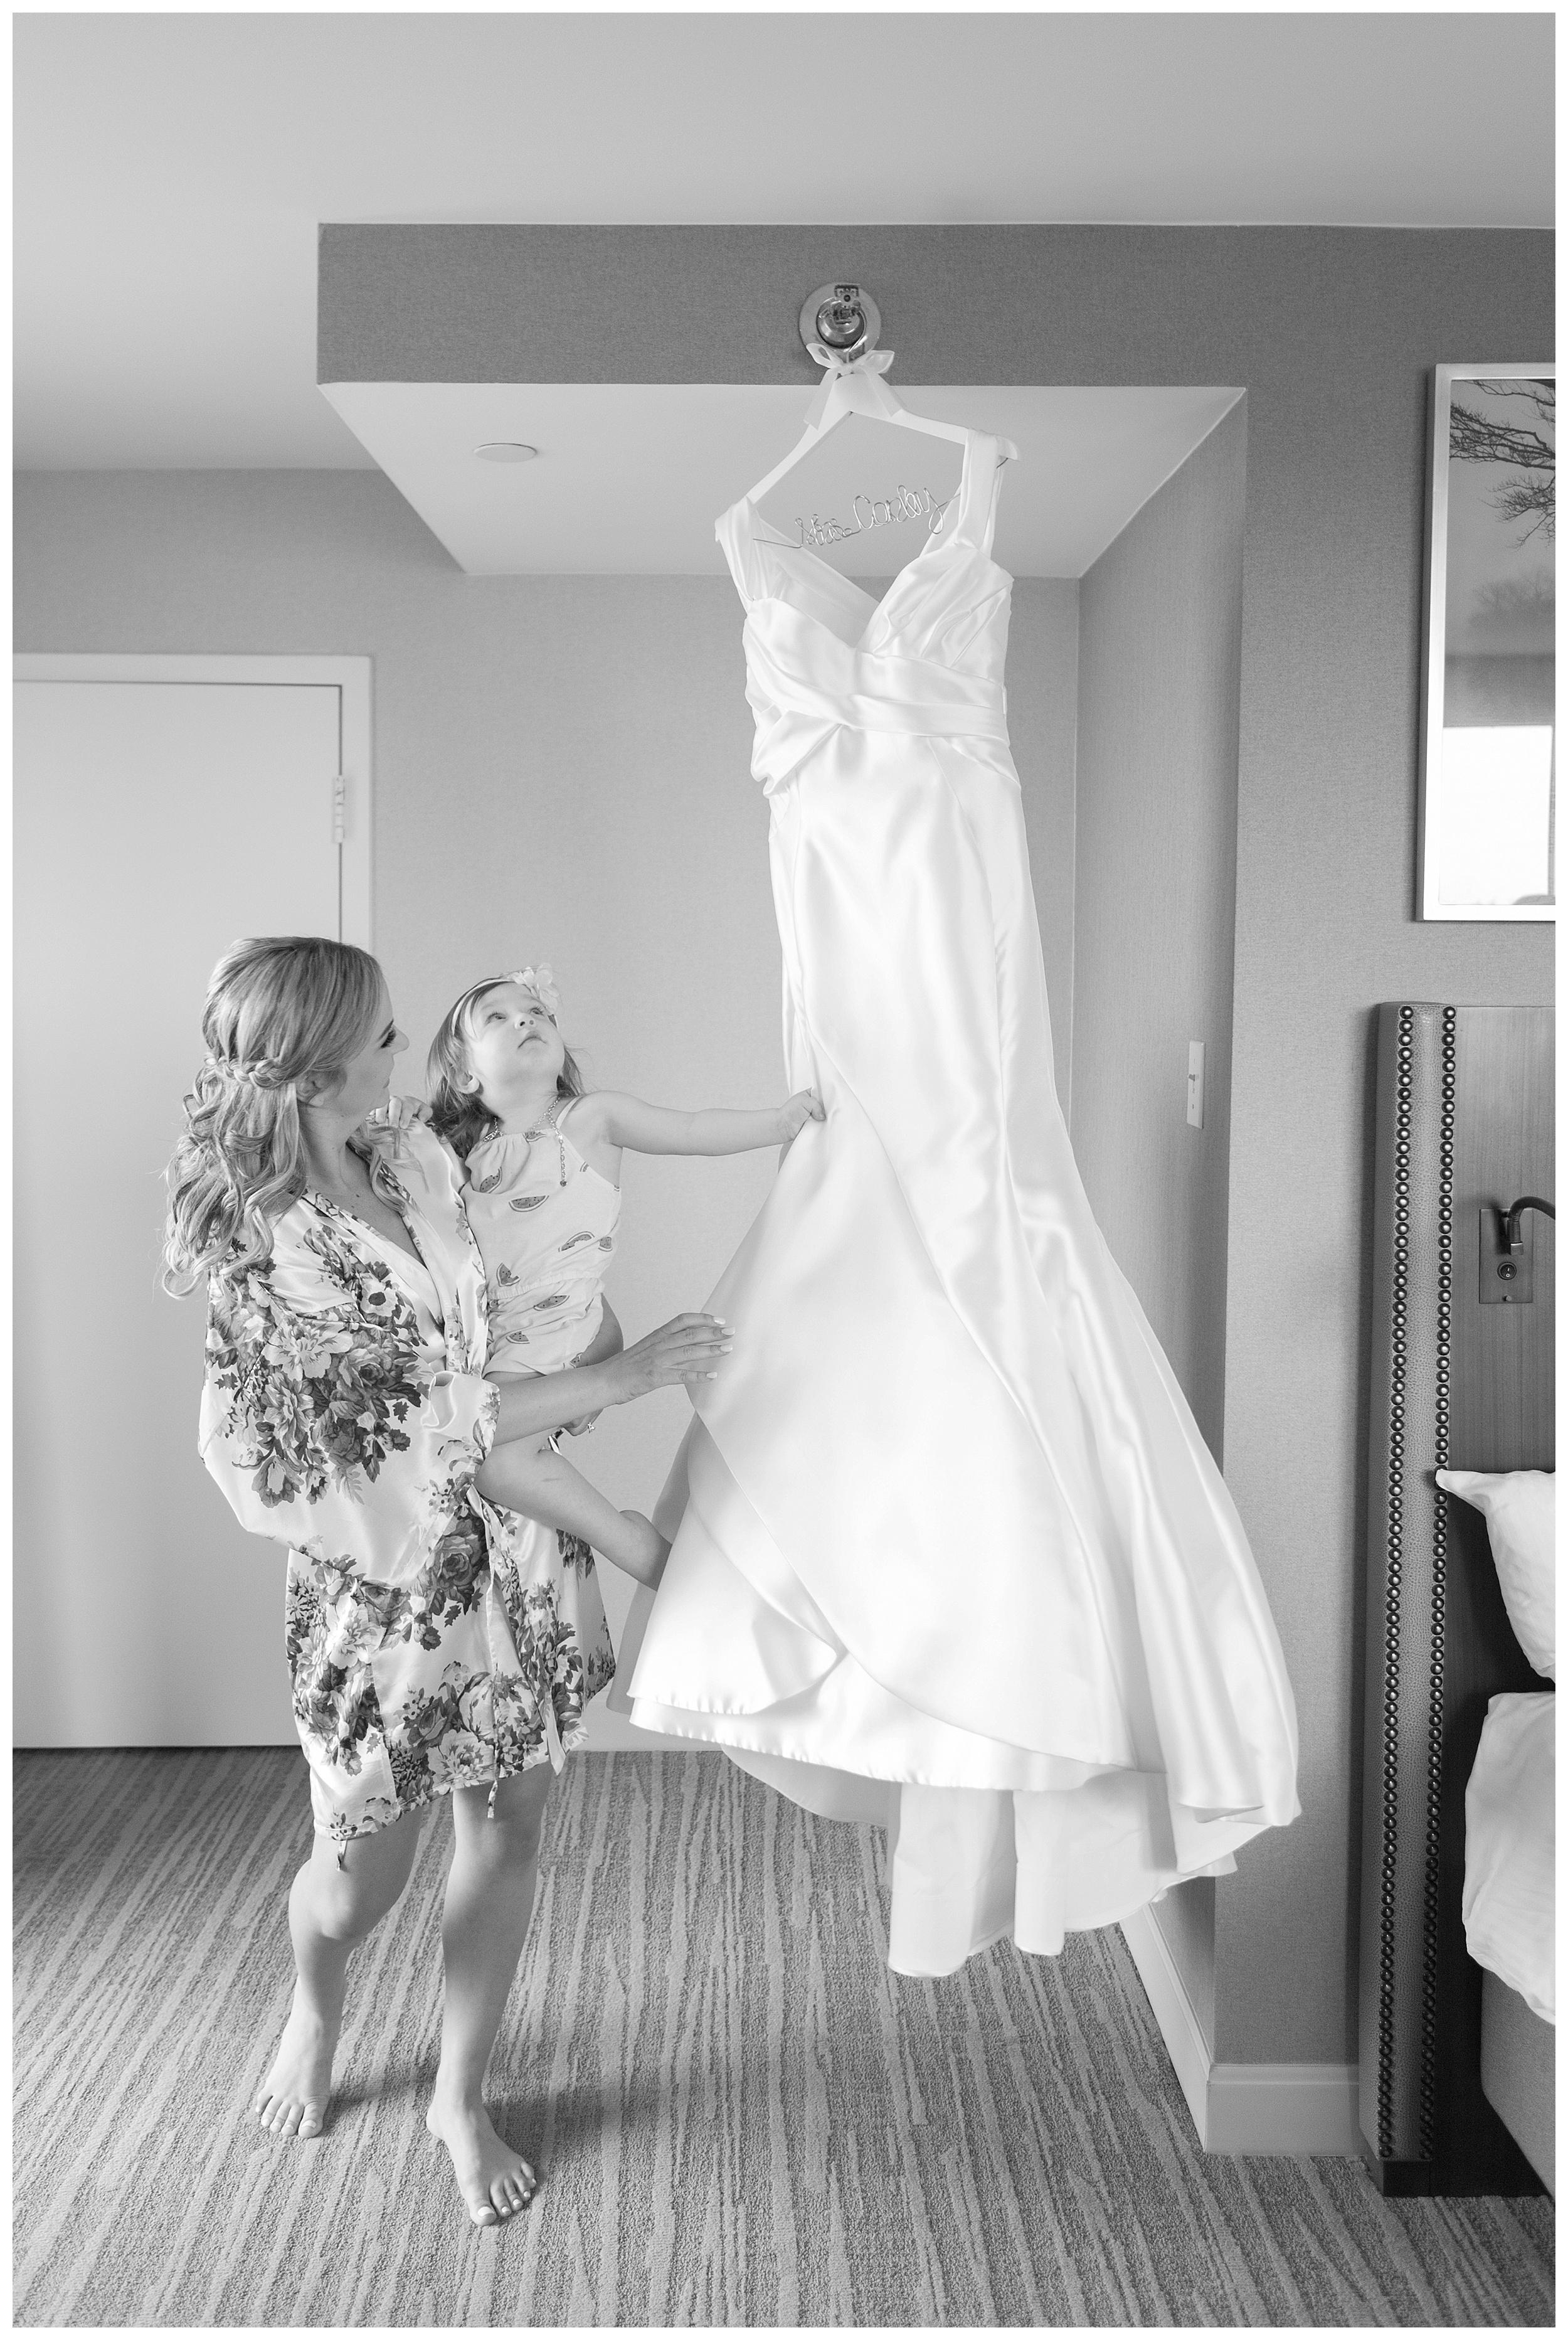 Lansdowne Resort Wedding | Virginia Film Wedding Photographer Kir Tuben_0003.jpg